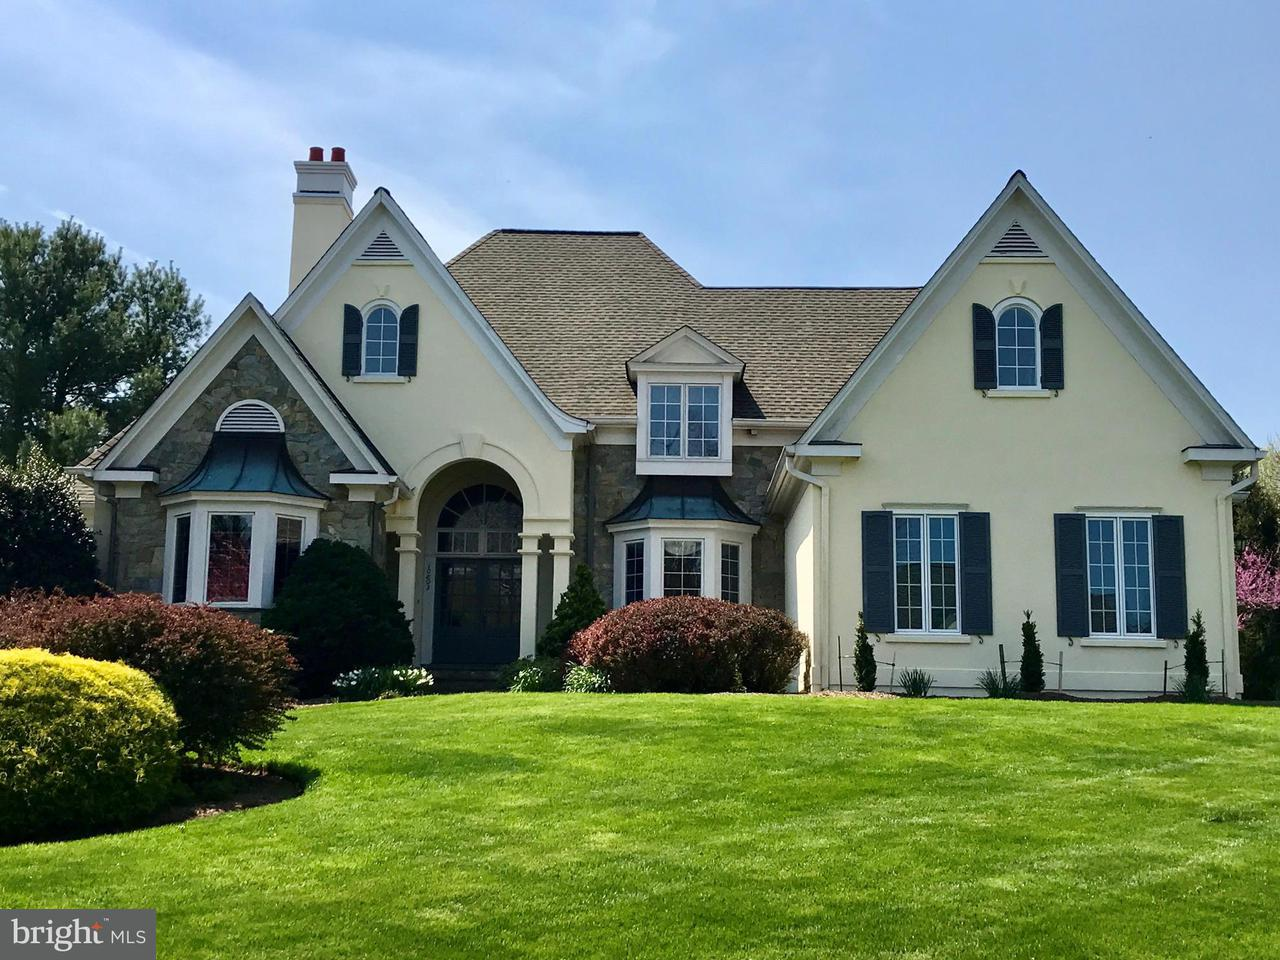 Single Family Home for Sale at 10803 Tradewind Drive 10803 Tradewind Drive Oakton, Virginia 22124 United States